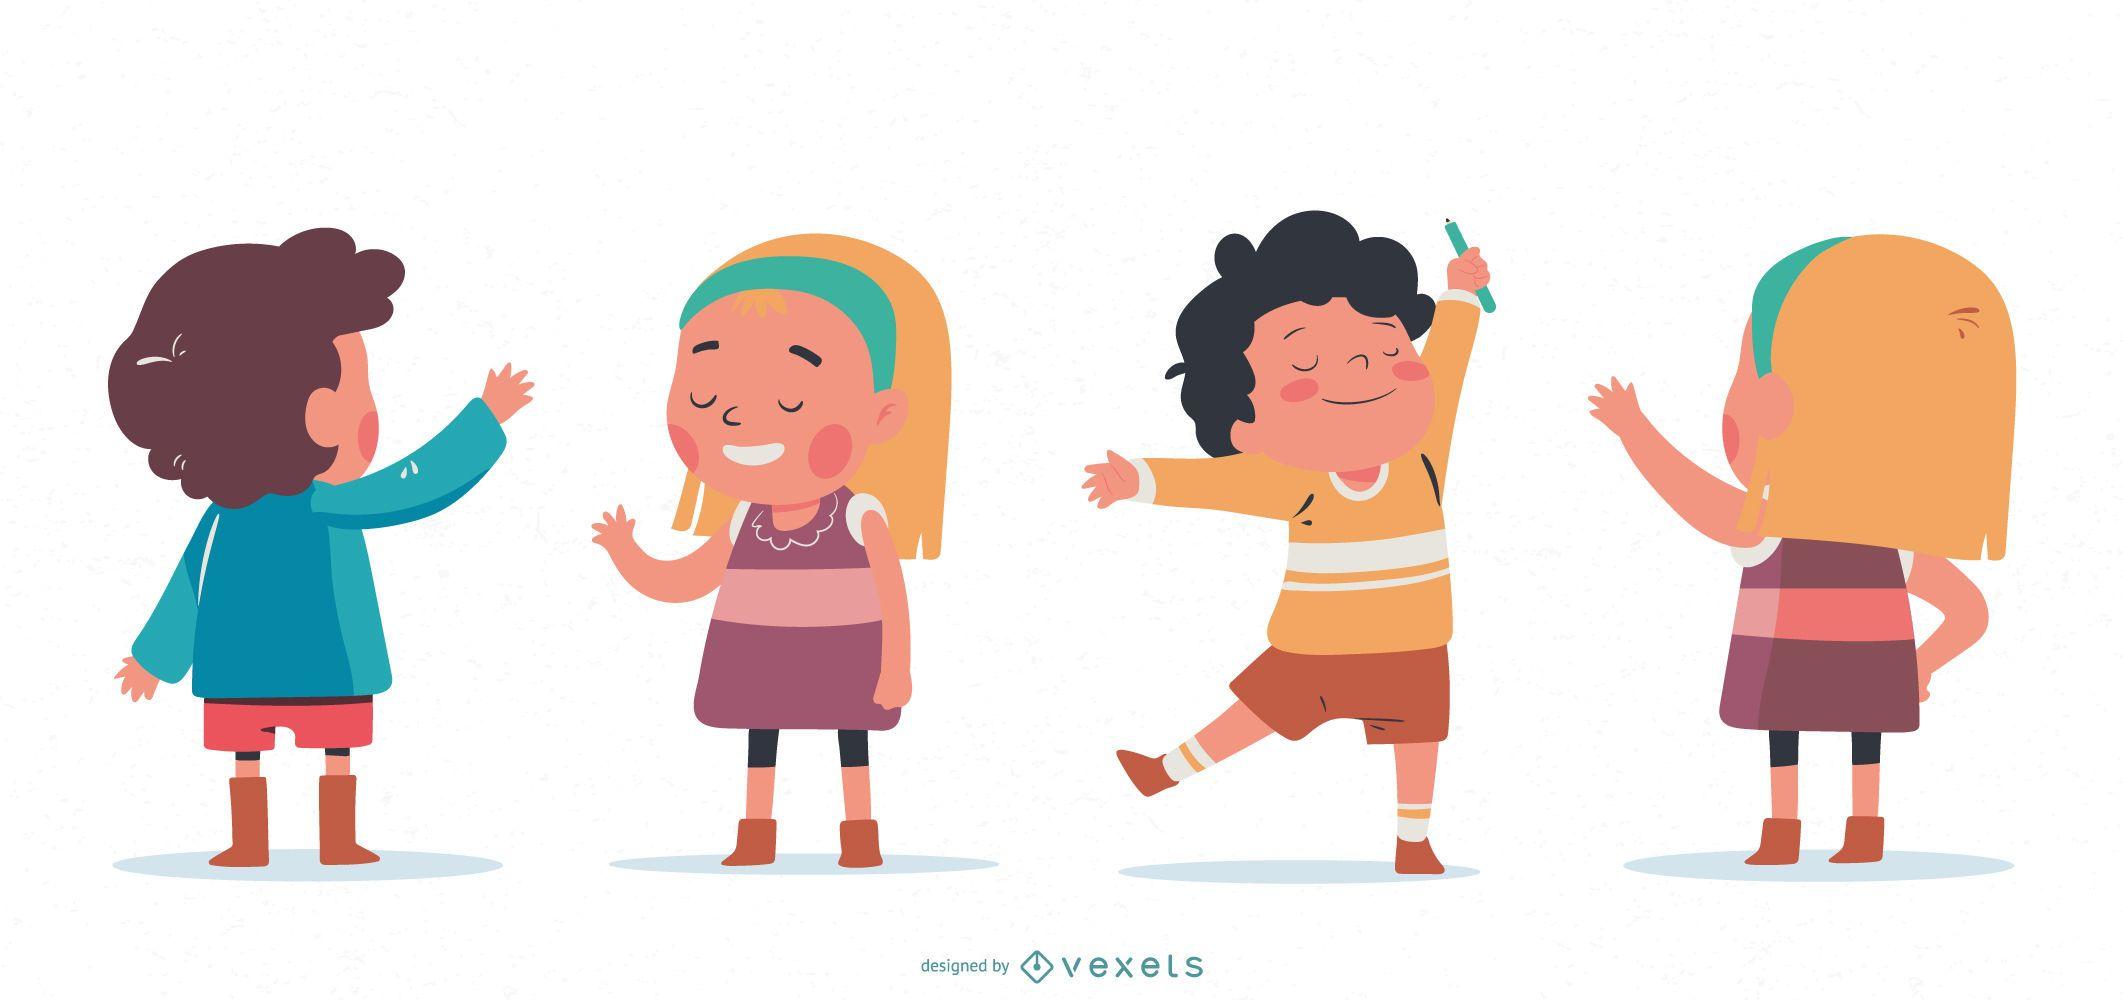 Kids waving character set